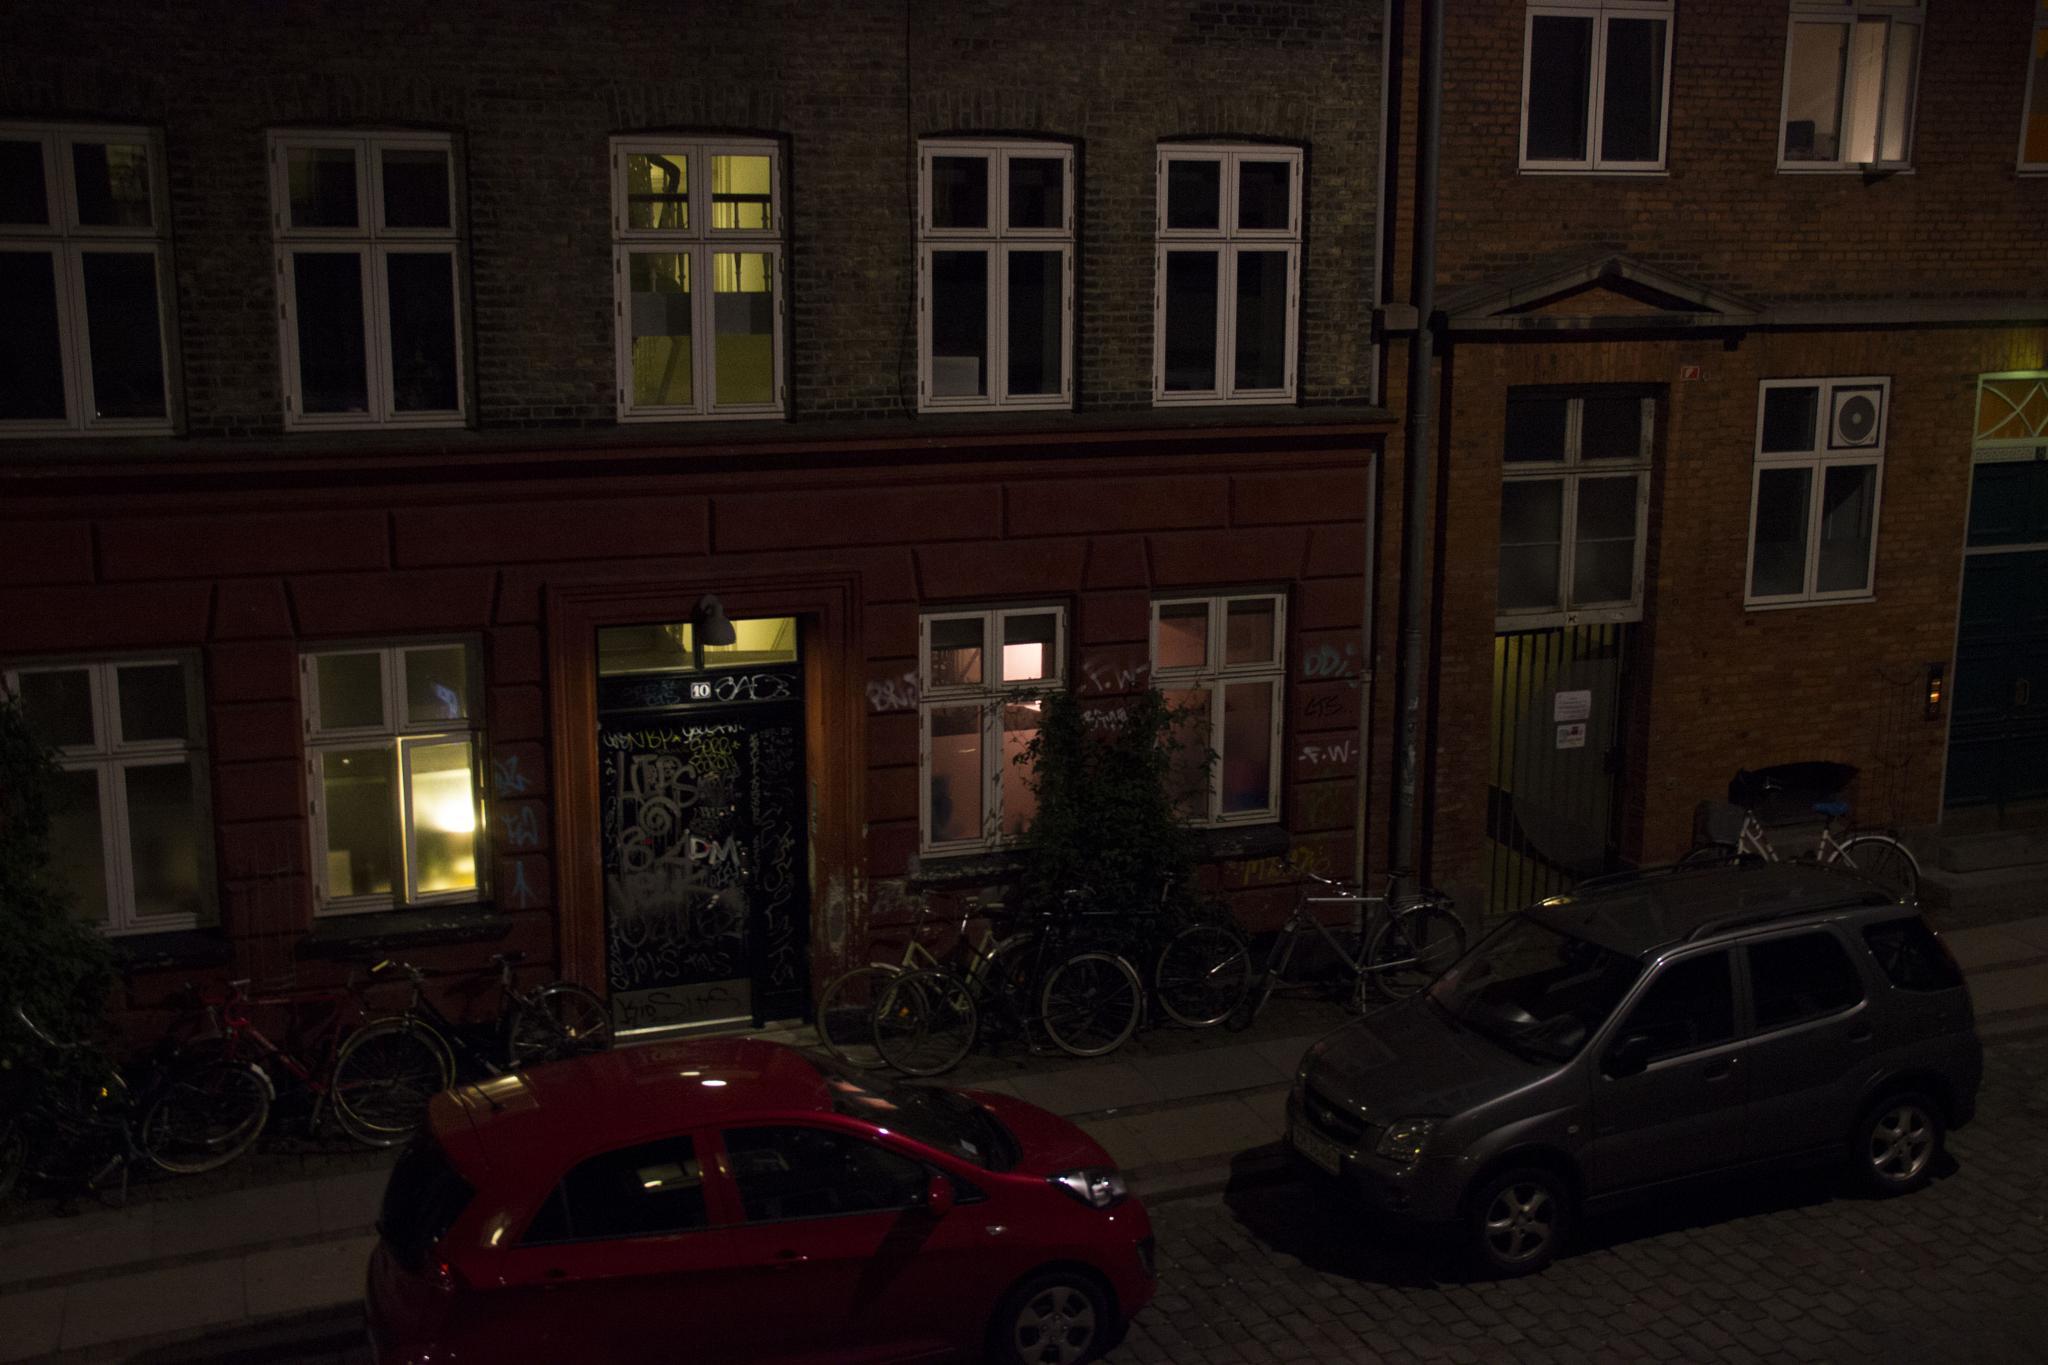 A night in Copenhagen by Nasta